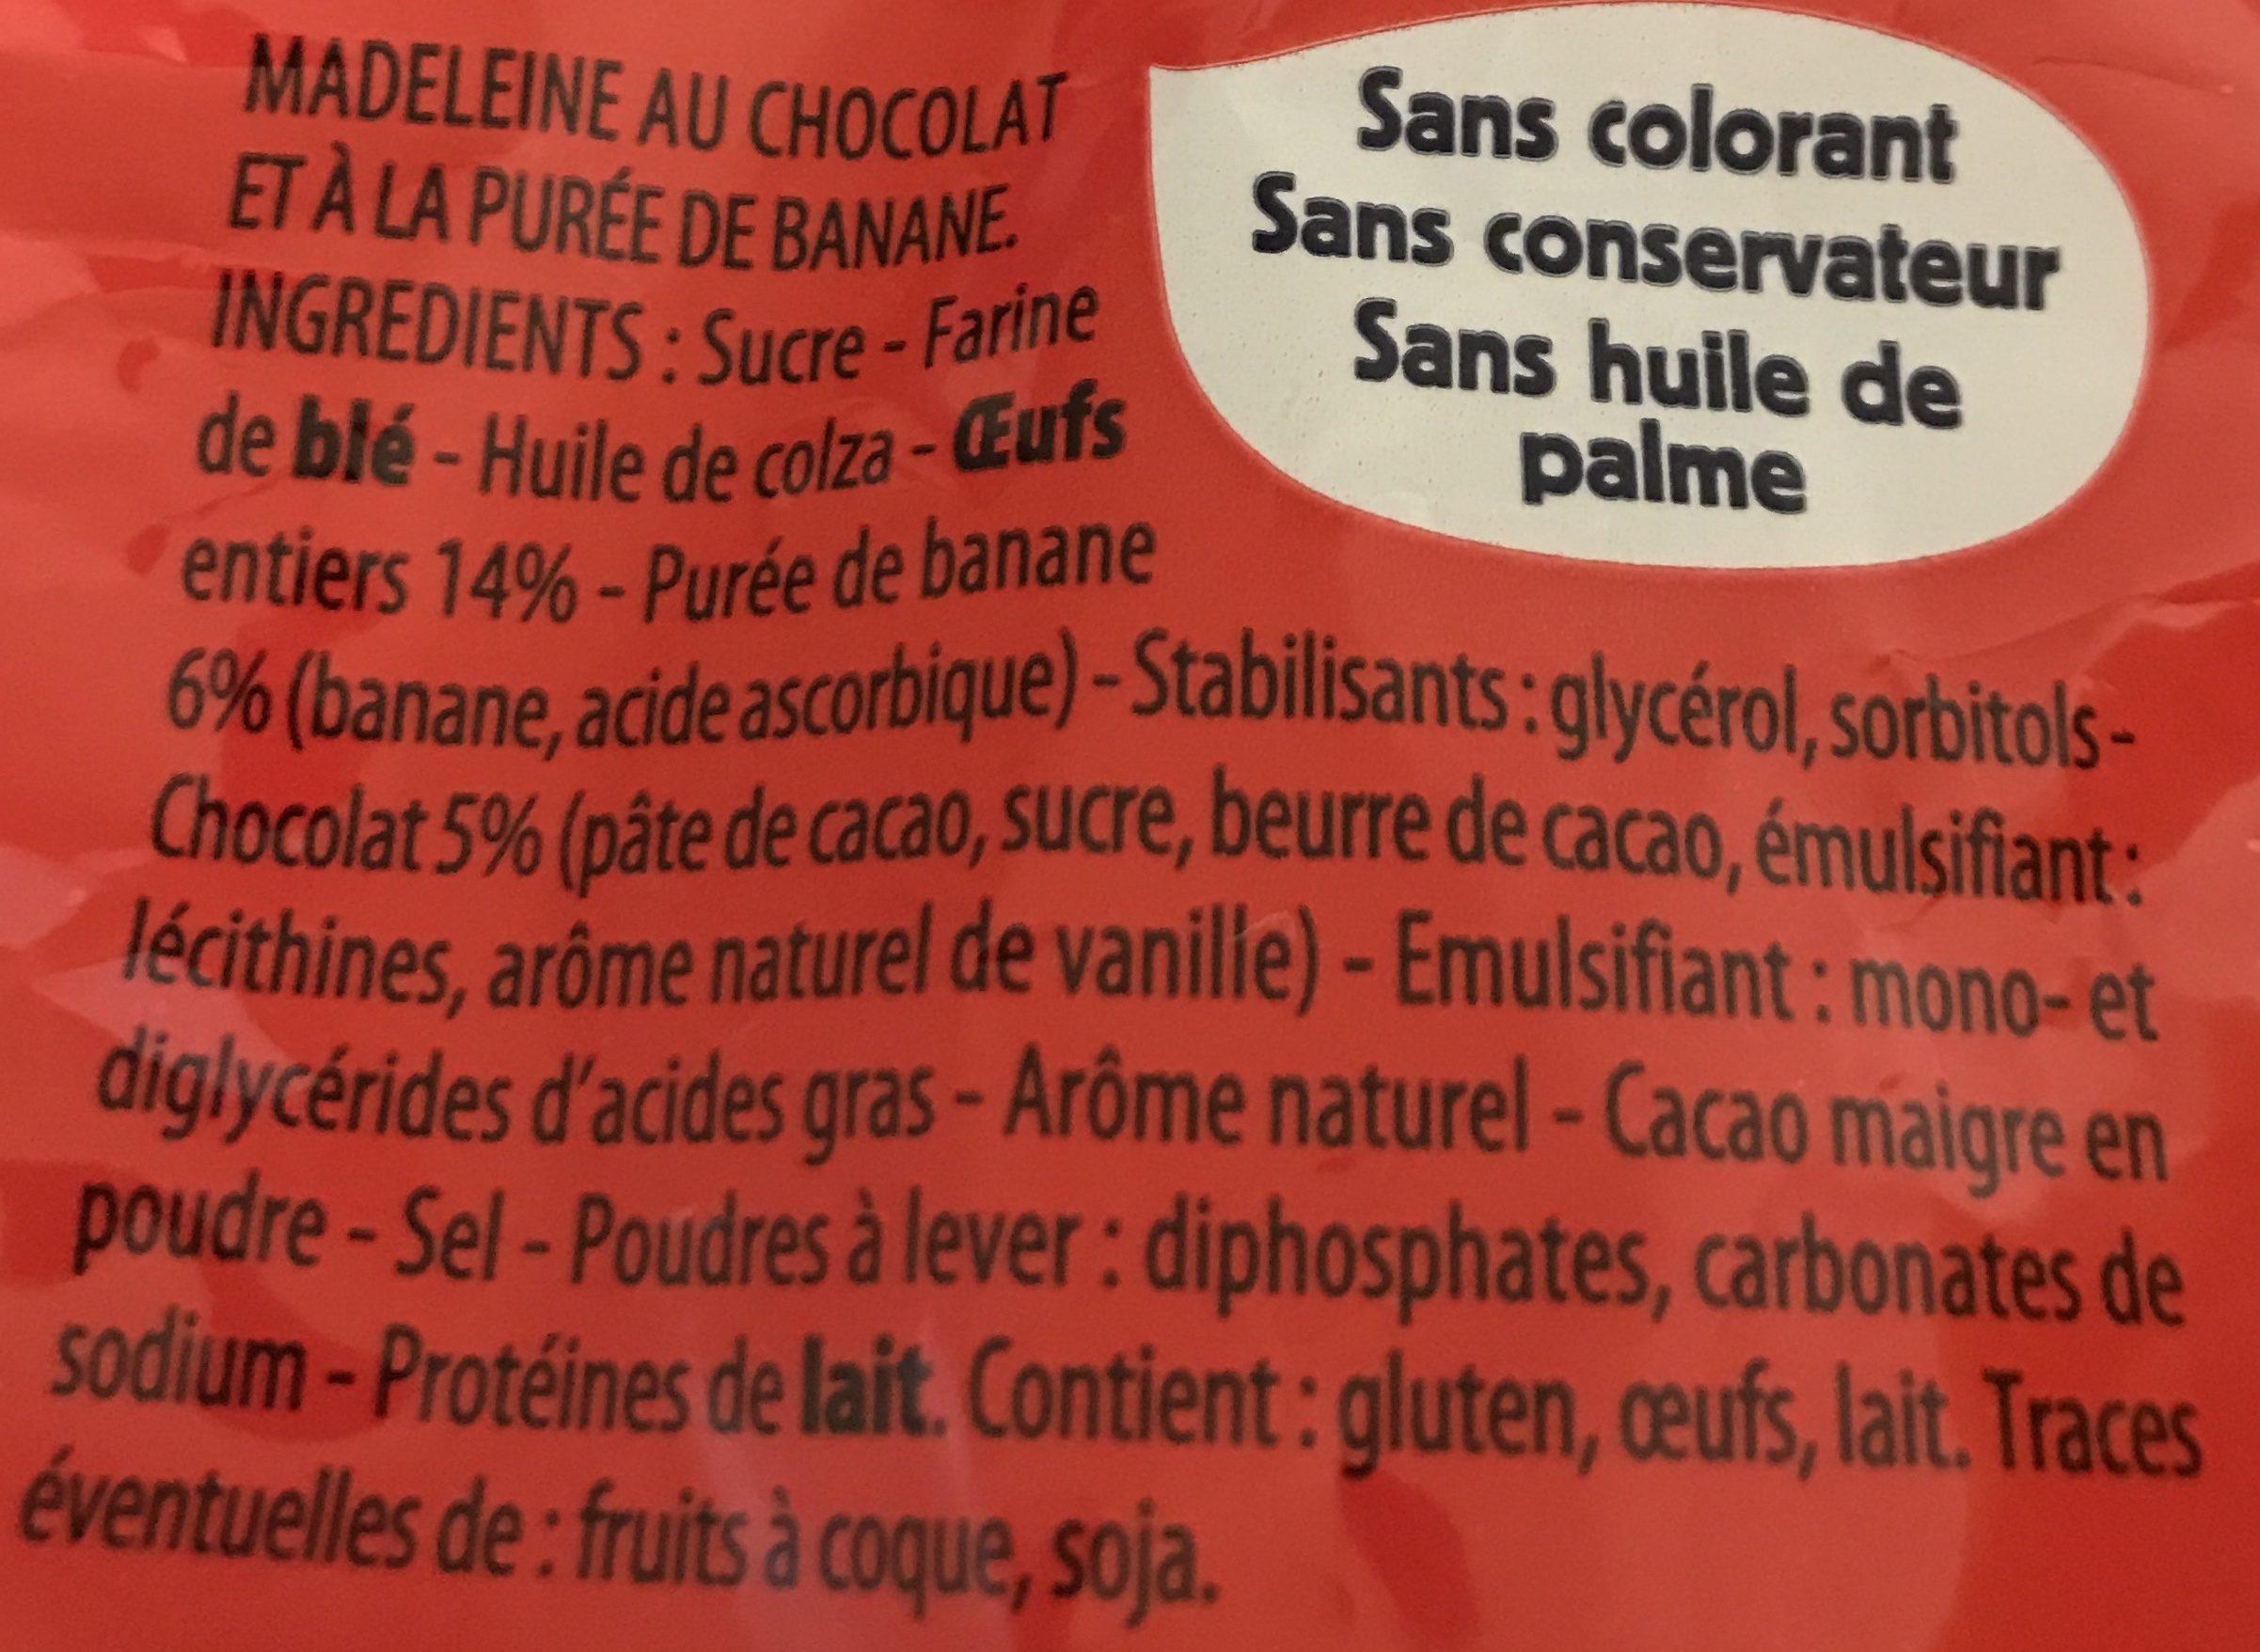 Madeleines Extra Moelleuses Chocolat et Banane - Ingrédients - fr